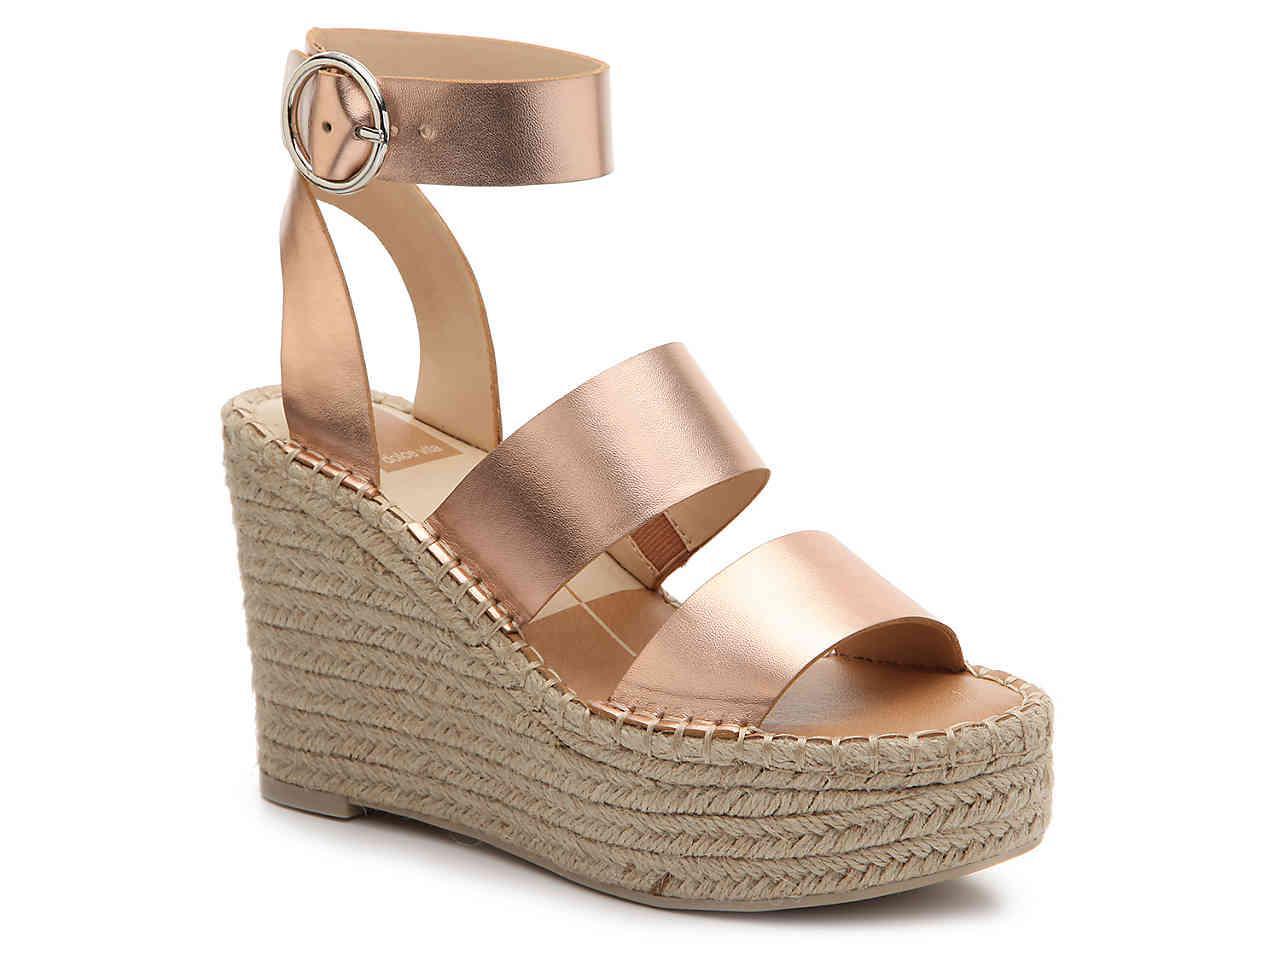 Shea Metallic Leather Cork Wedge Sandals SsAR0rT2H